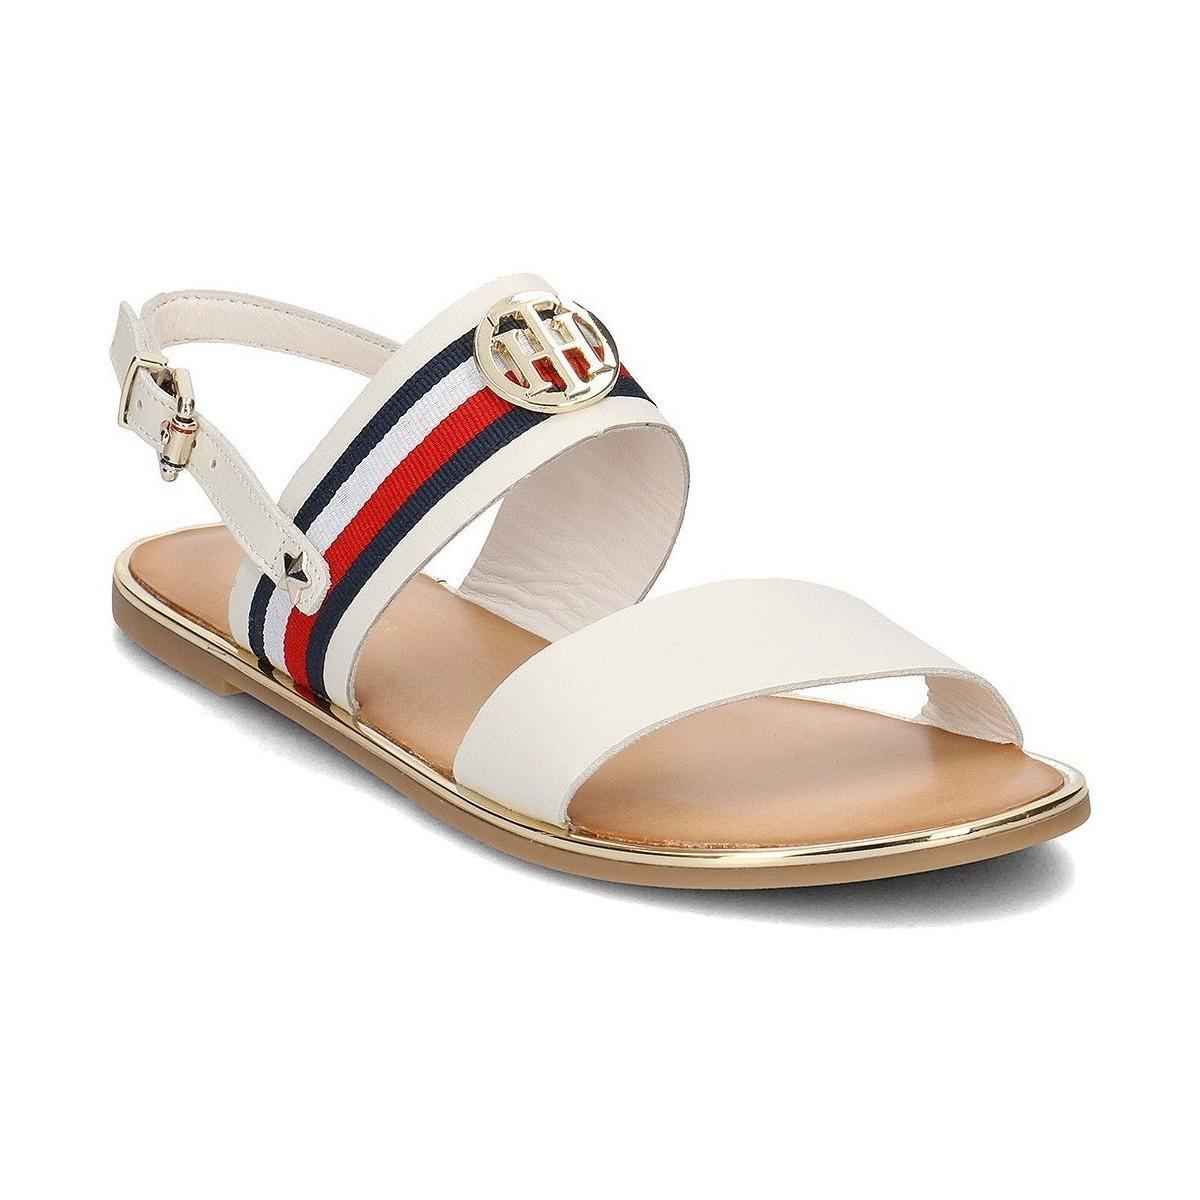 dc94c847f23a32 Tommy Hilfiger Corporate Ribbon Flat Sandal Whisper Women s Sandals ...